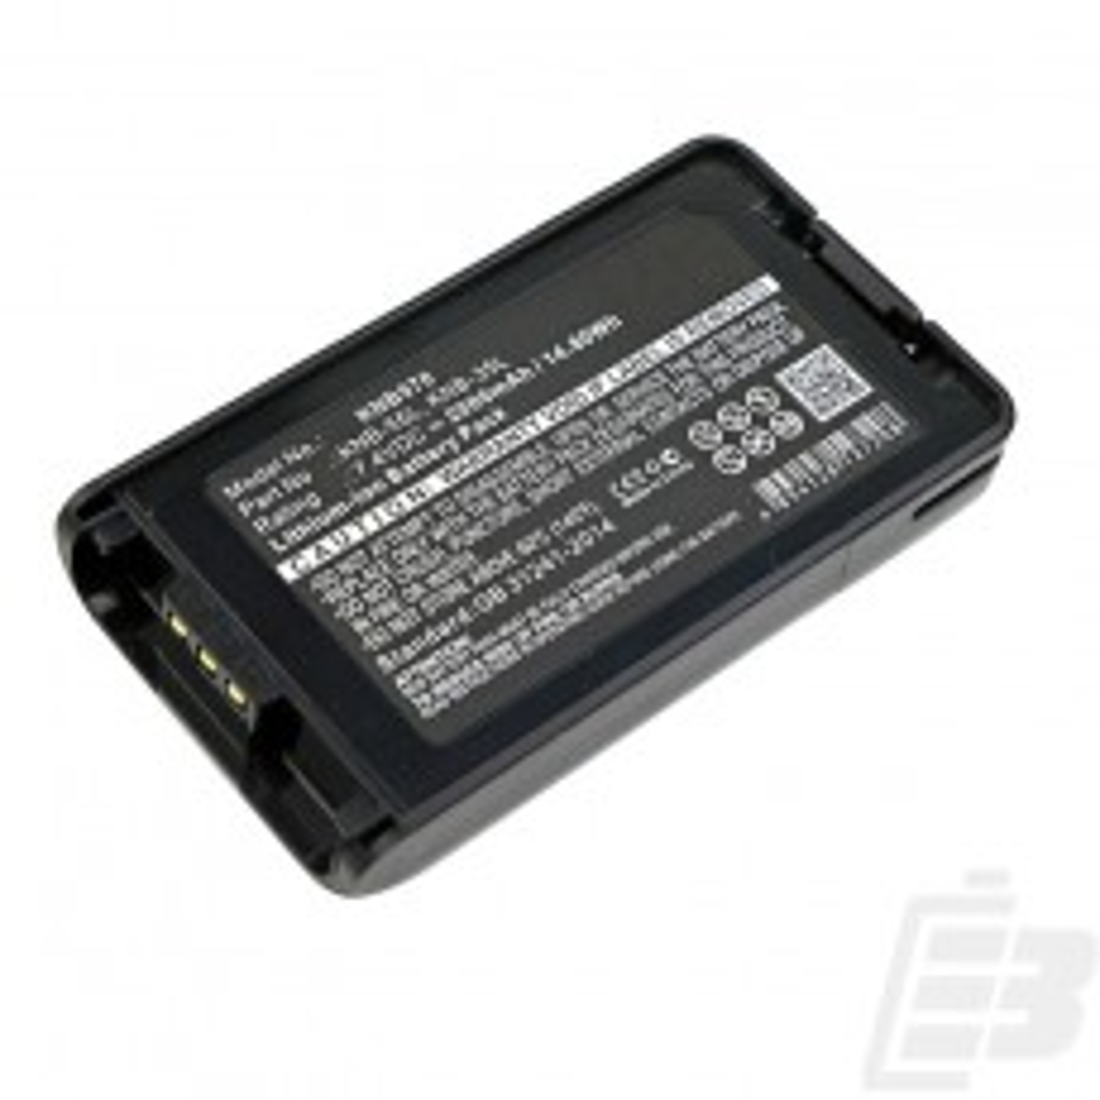 Two-Way radio battery Kenwood KNB-57L_1